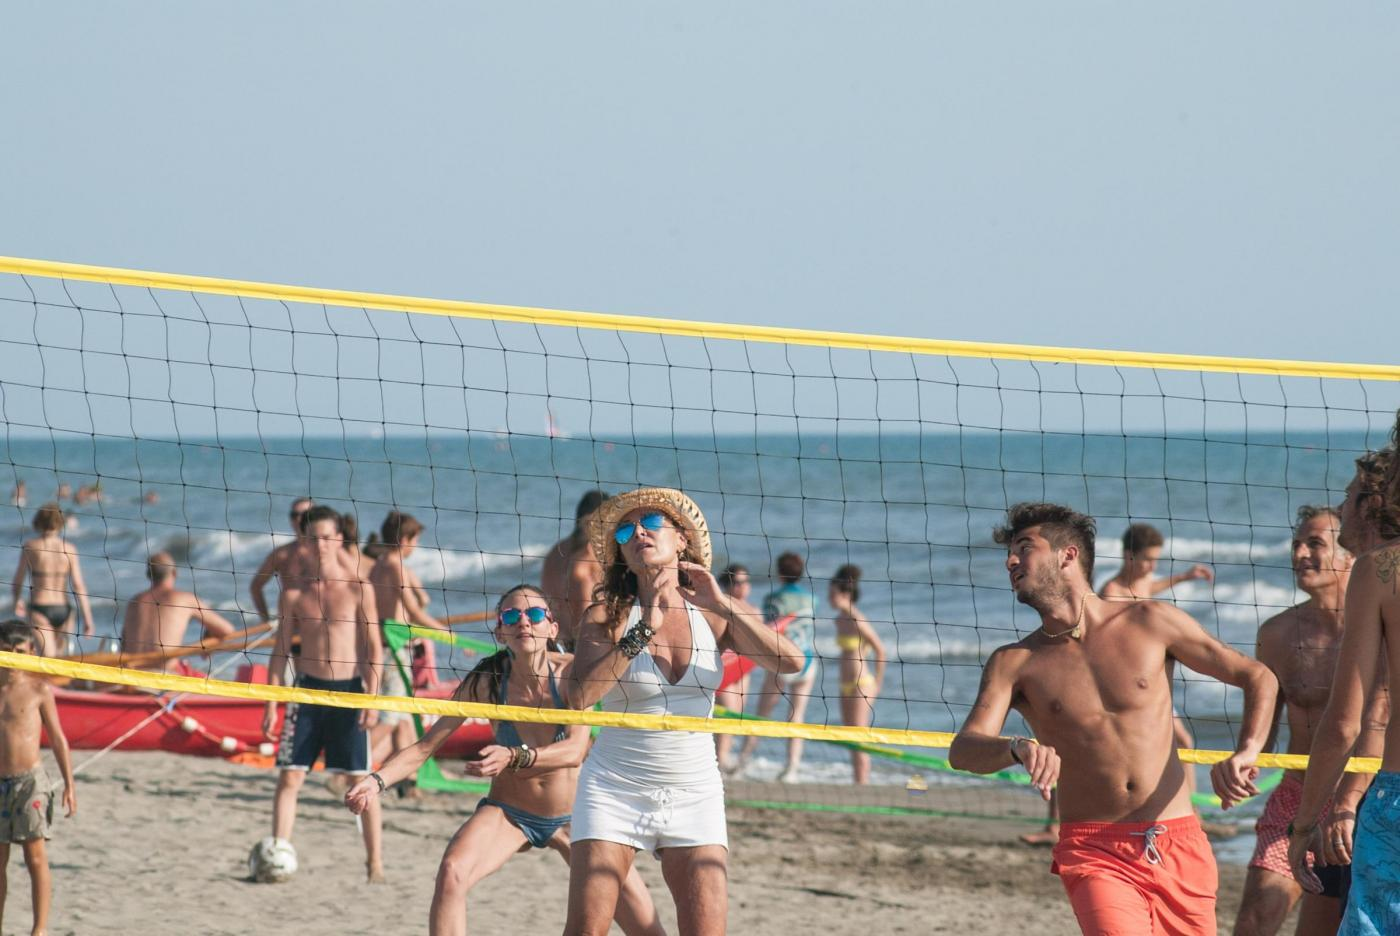 Daniela Santanchè fisico da ragazzina: in vacanza gioca a beach volley 12